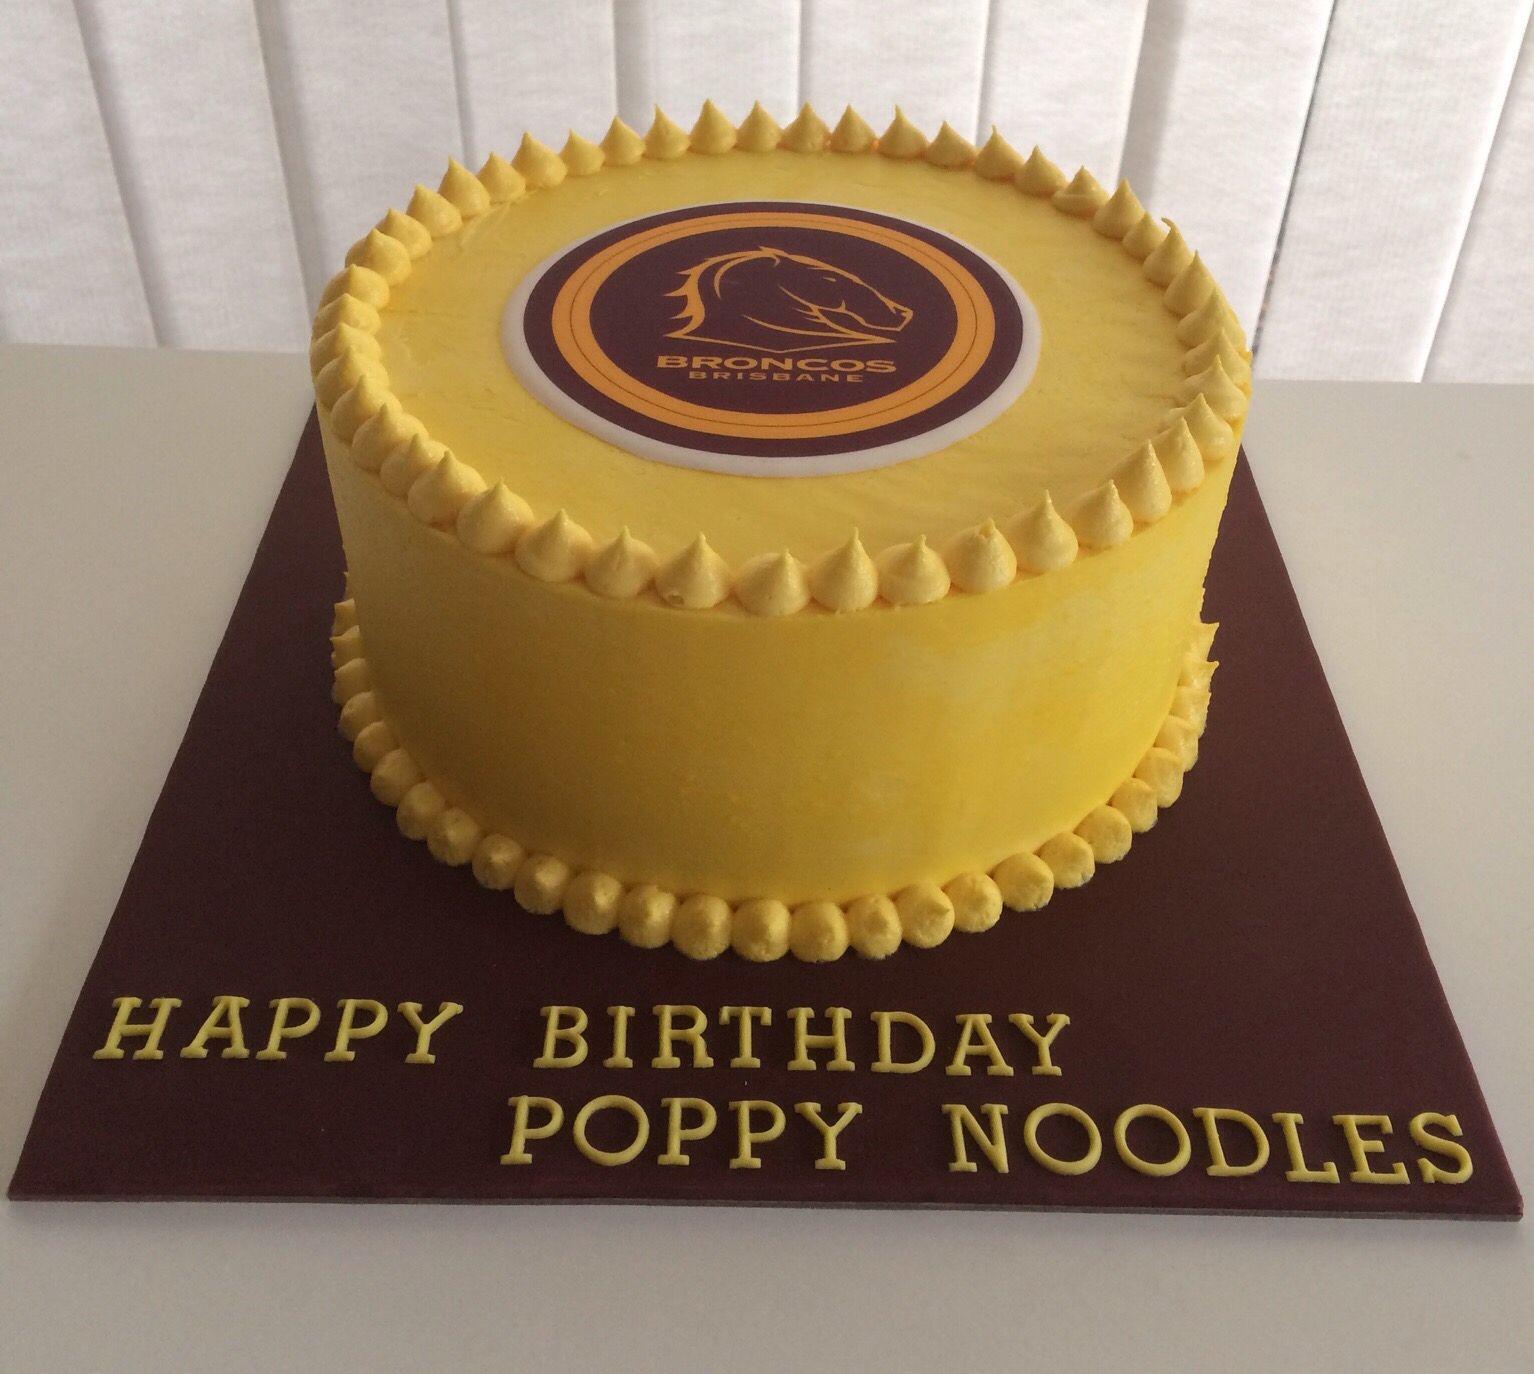 Brisbane Broncos cake My Cakes in 2019 Cake, Birthday